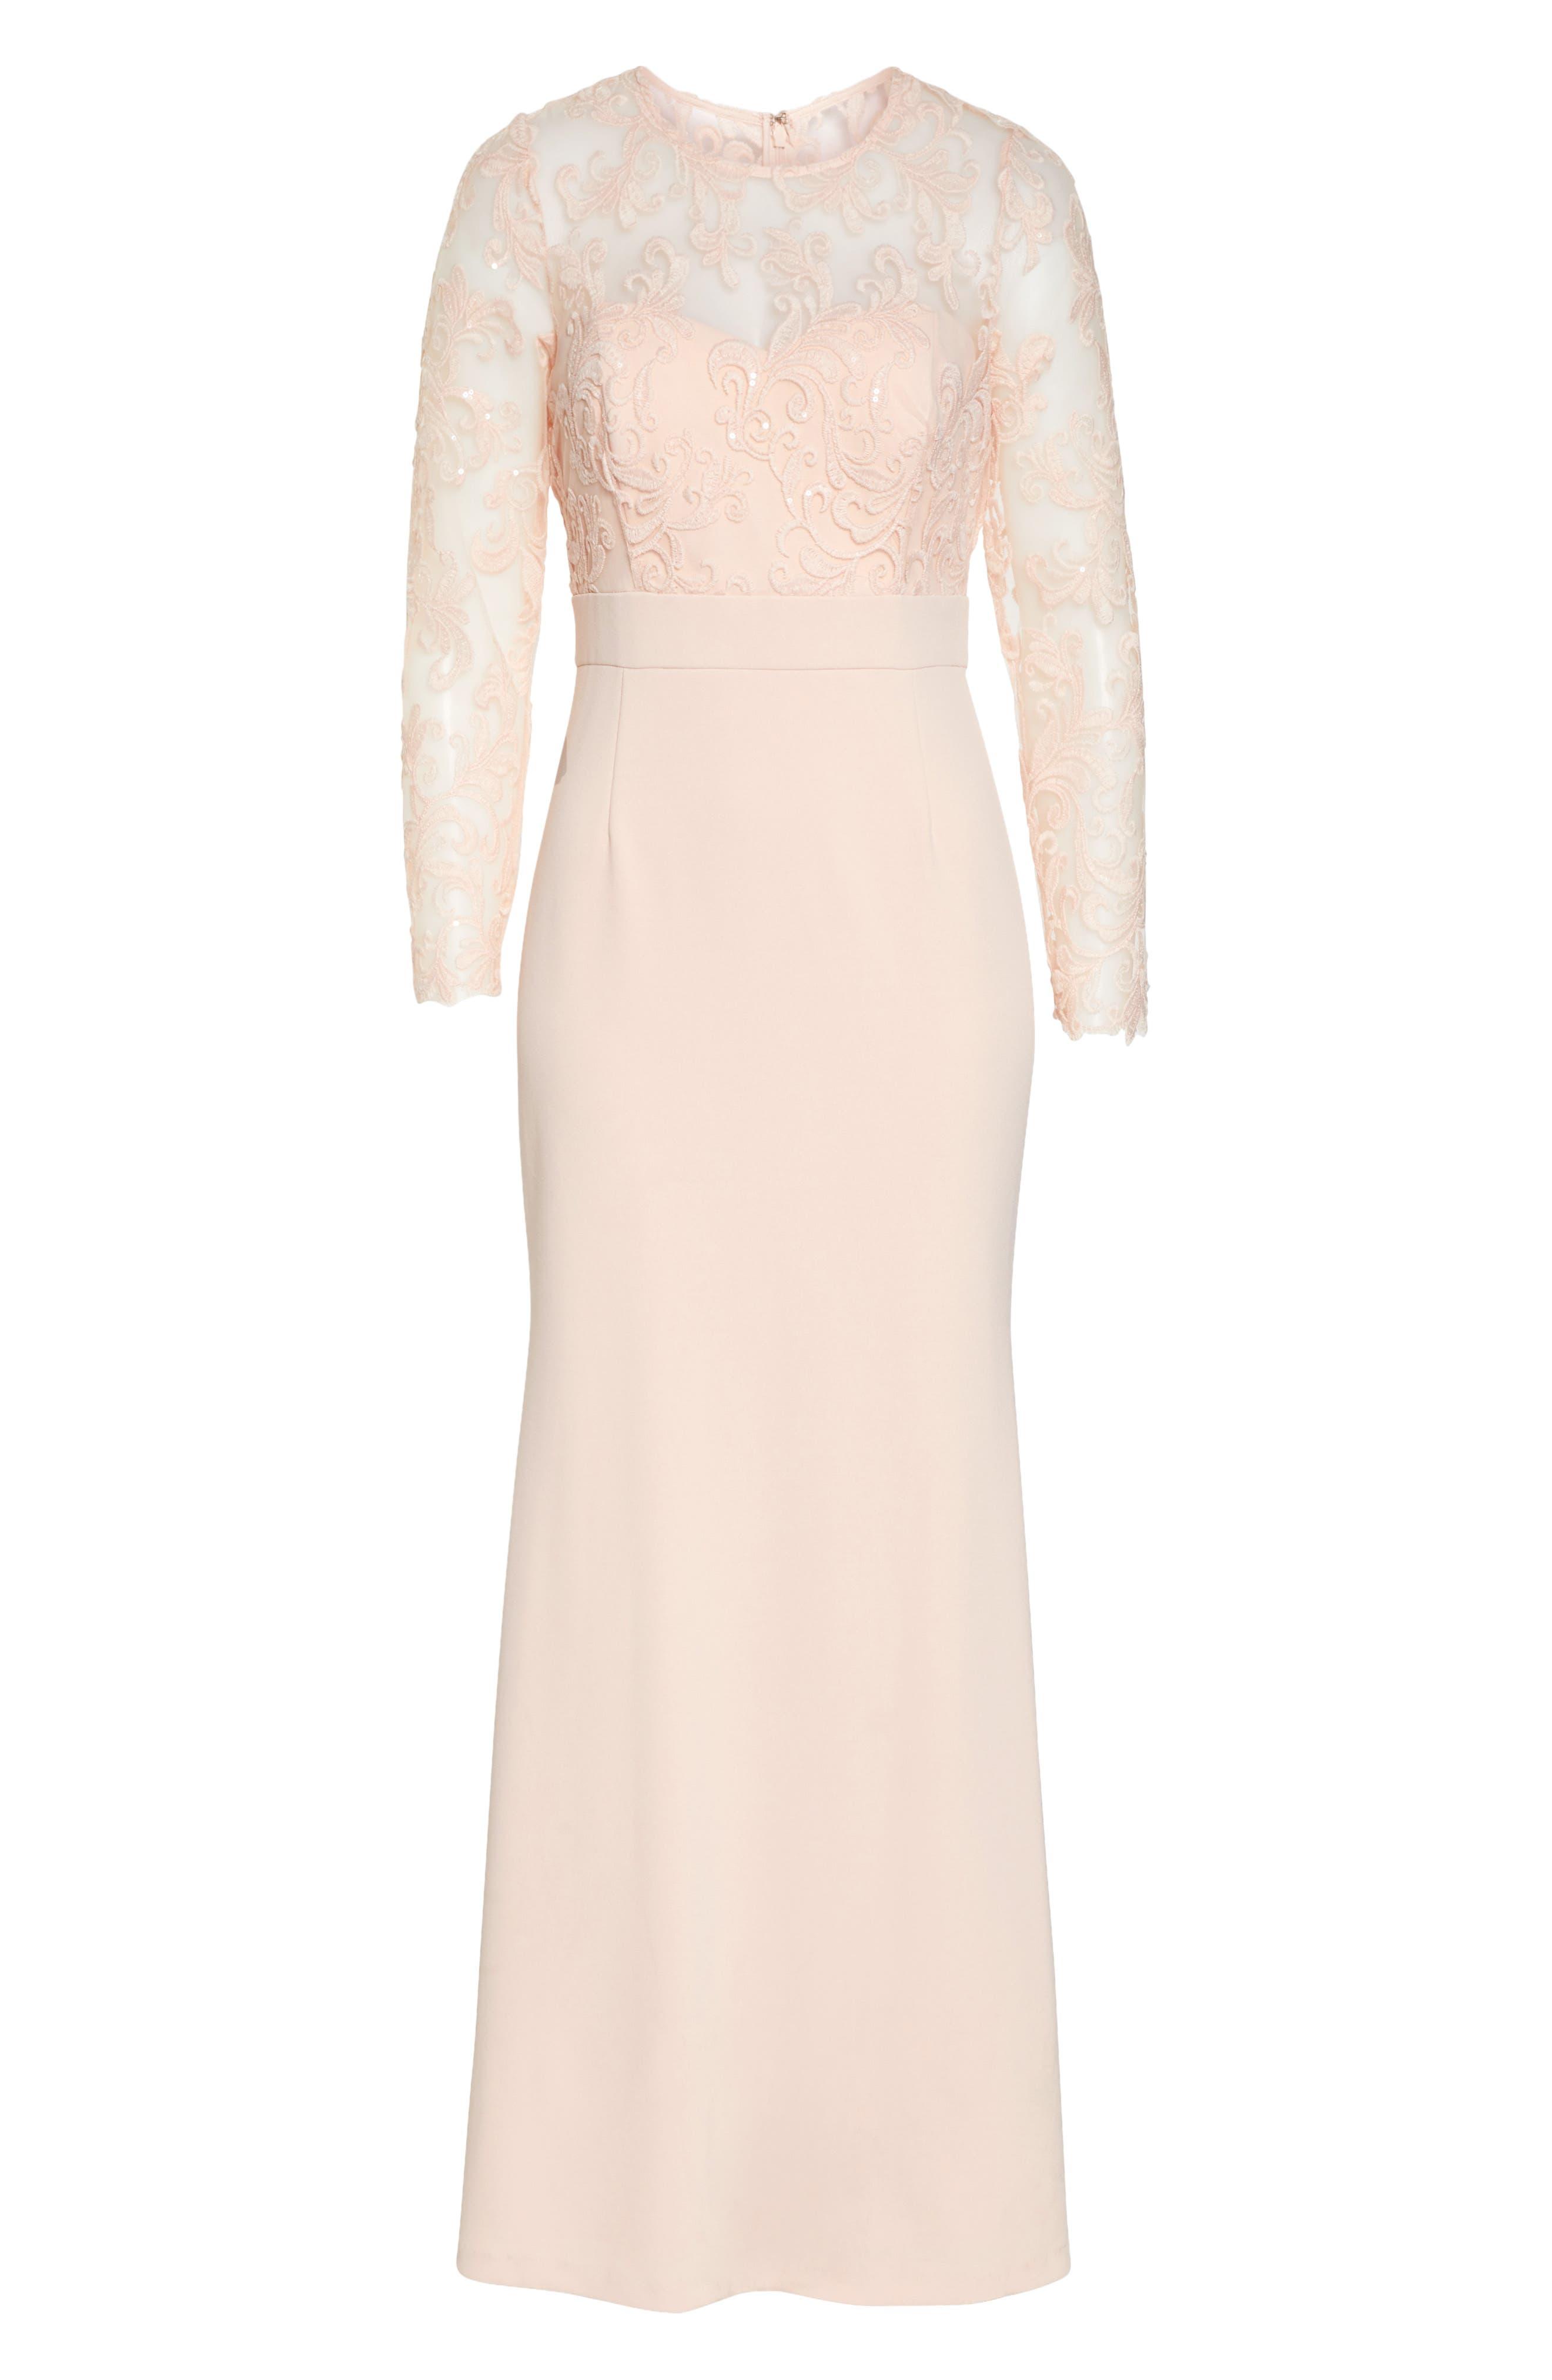 ELIZA J, Embroidered Bodice Crepe Evening Dress, Alternate thumbnail 8, color, BLUSH